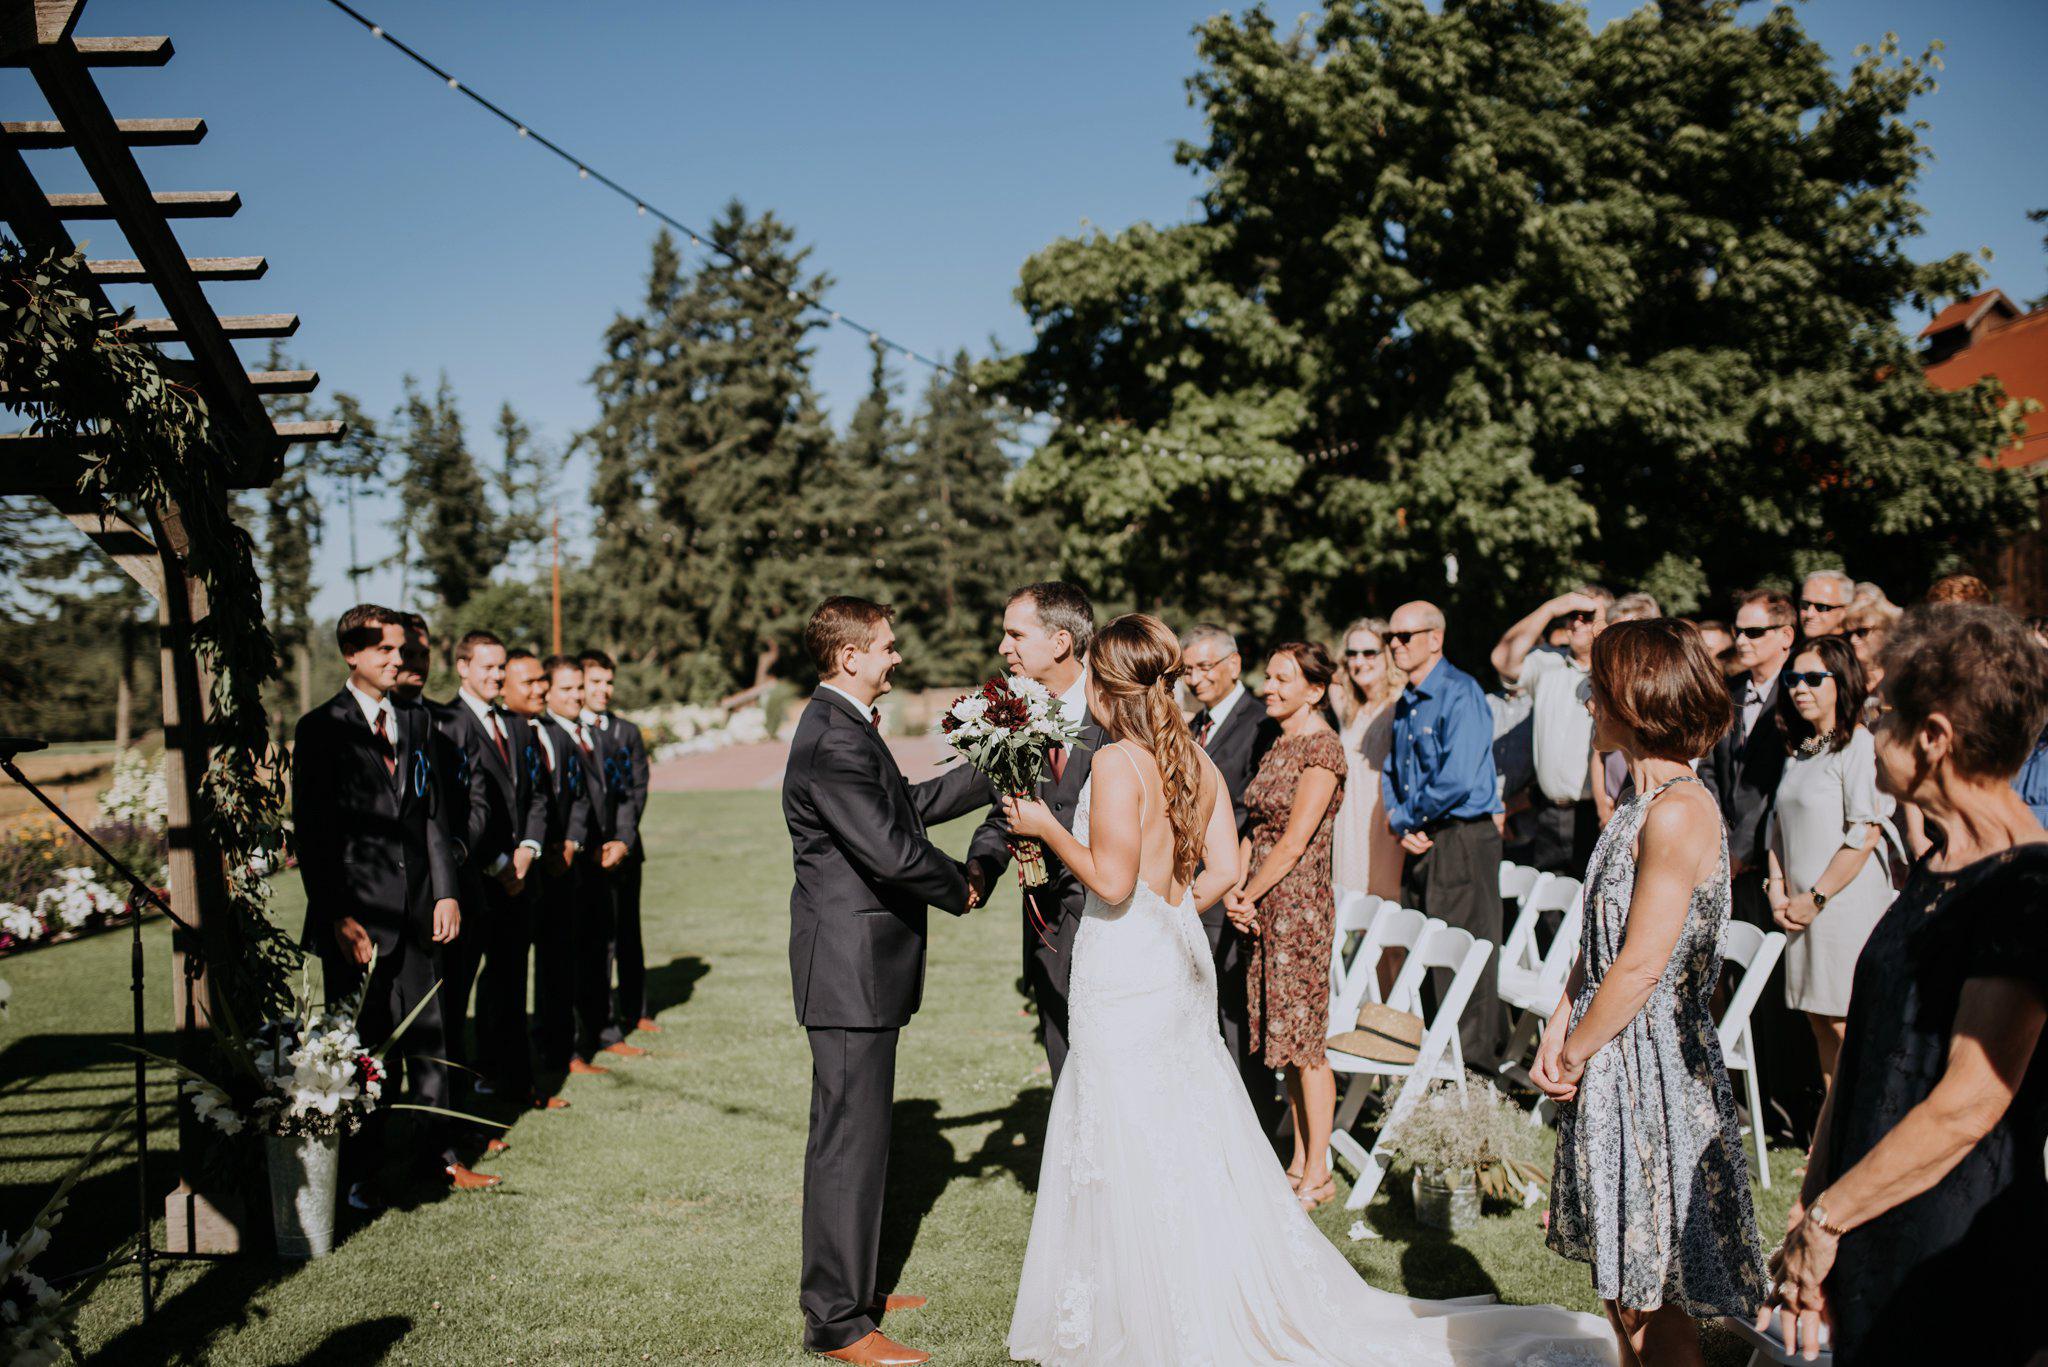 kristen-and-cody-the-kelley-farm-wedding-seattle-photographer-caitlyn-nikula-61.jpg